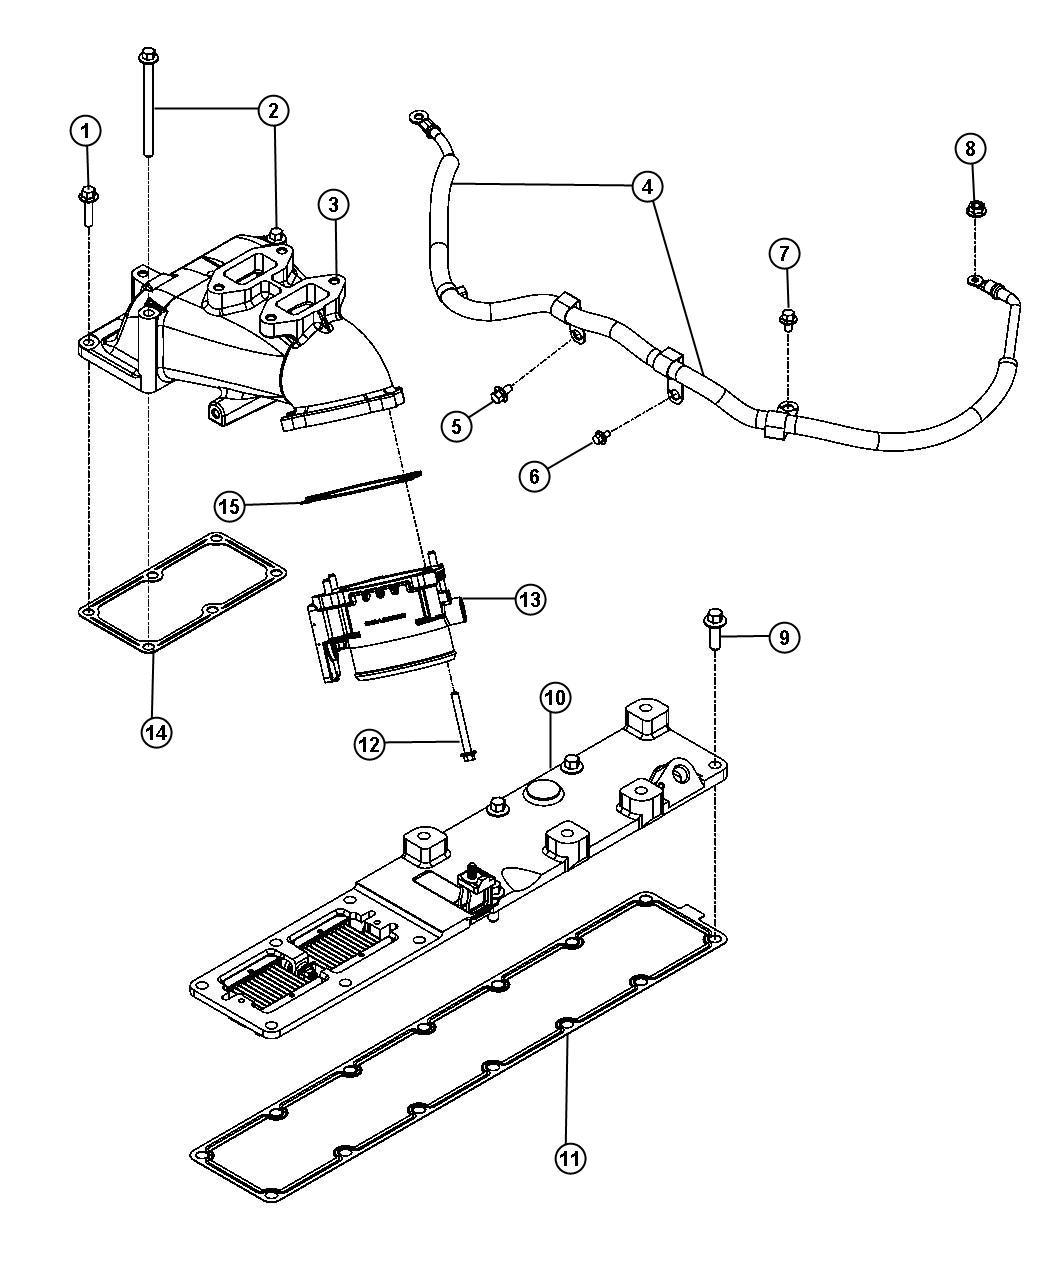 2010 Dodge Ram 2500 Wiring. Air intake heater. [export